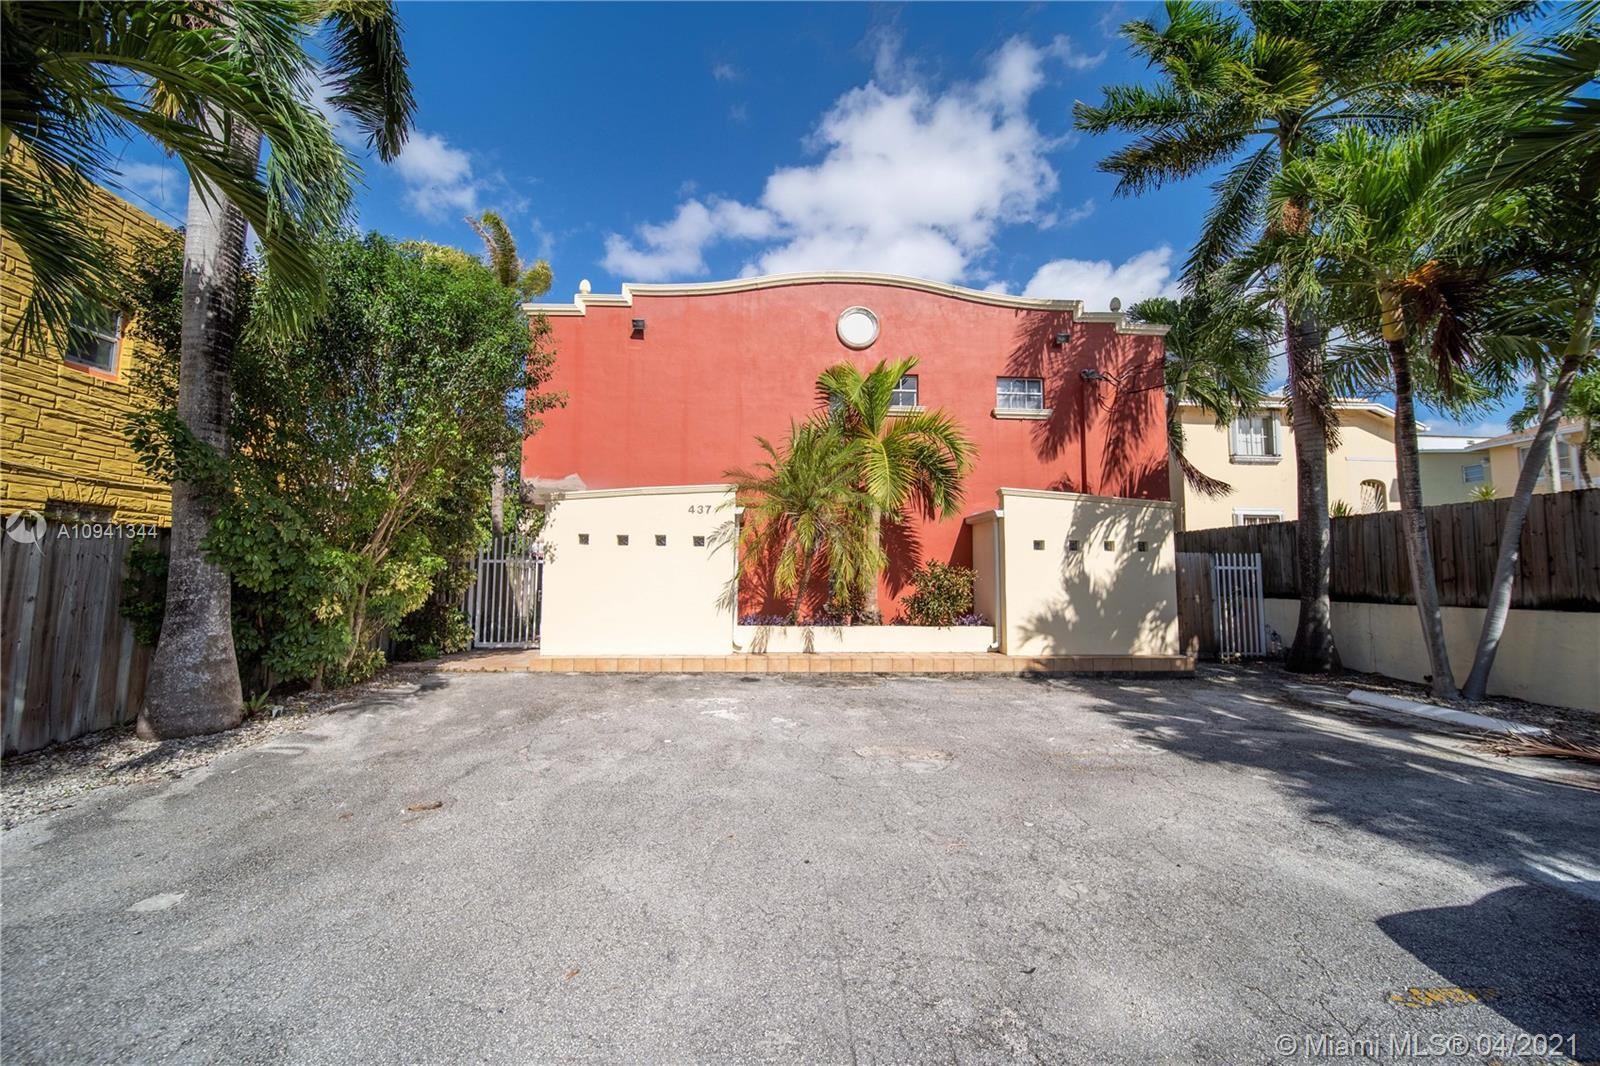 437 SW 3rd St #3, Miami, FL 33130 - #: A10941344